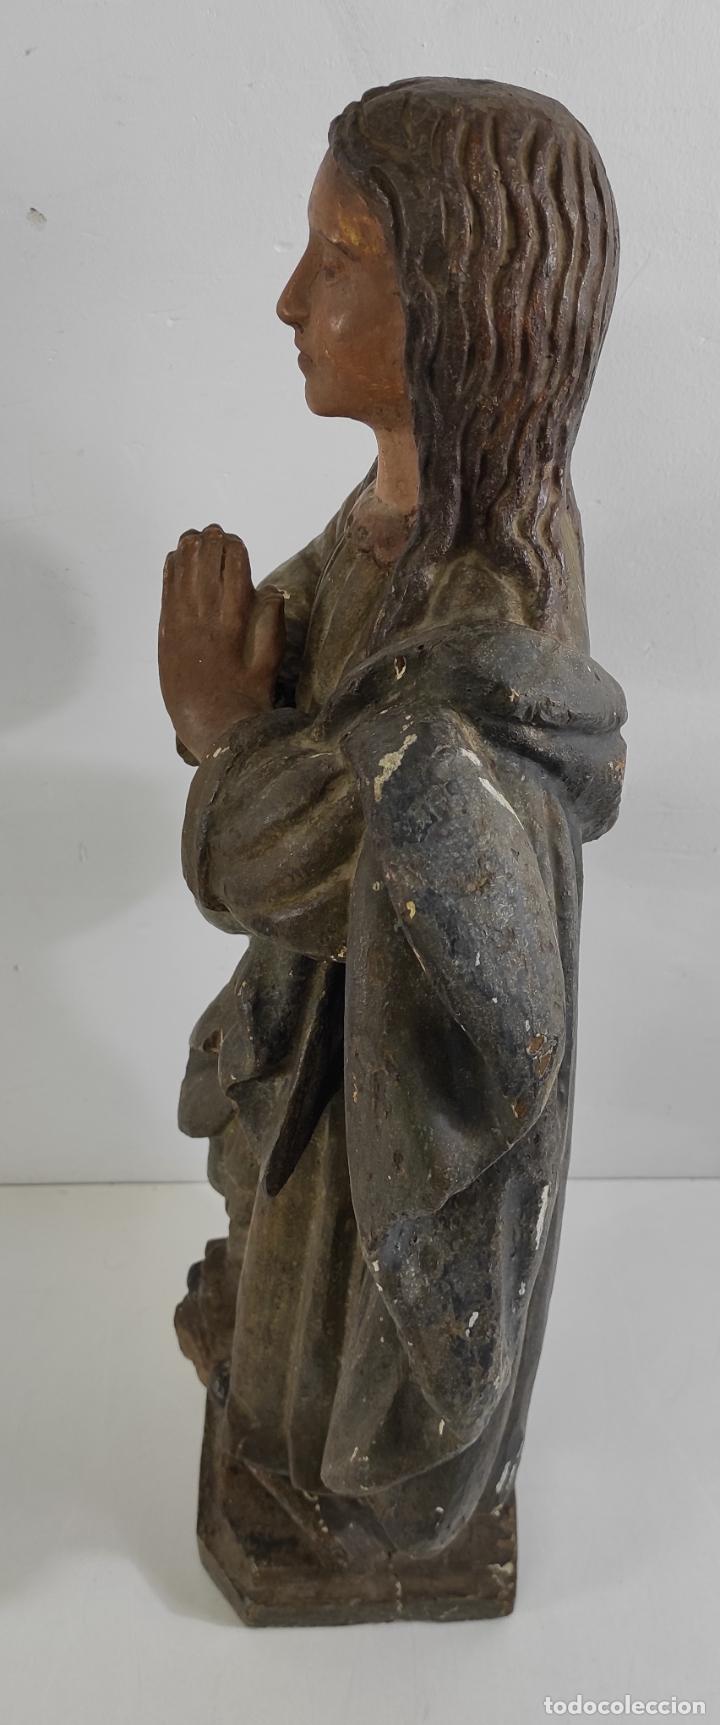 Arte: Virgen Purísima - Talla Popular en Madera de Encina Policromada - Escuela Catalana - S. XVII - Foto 13 - 254490140